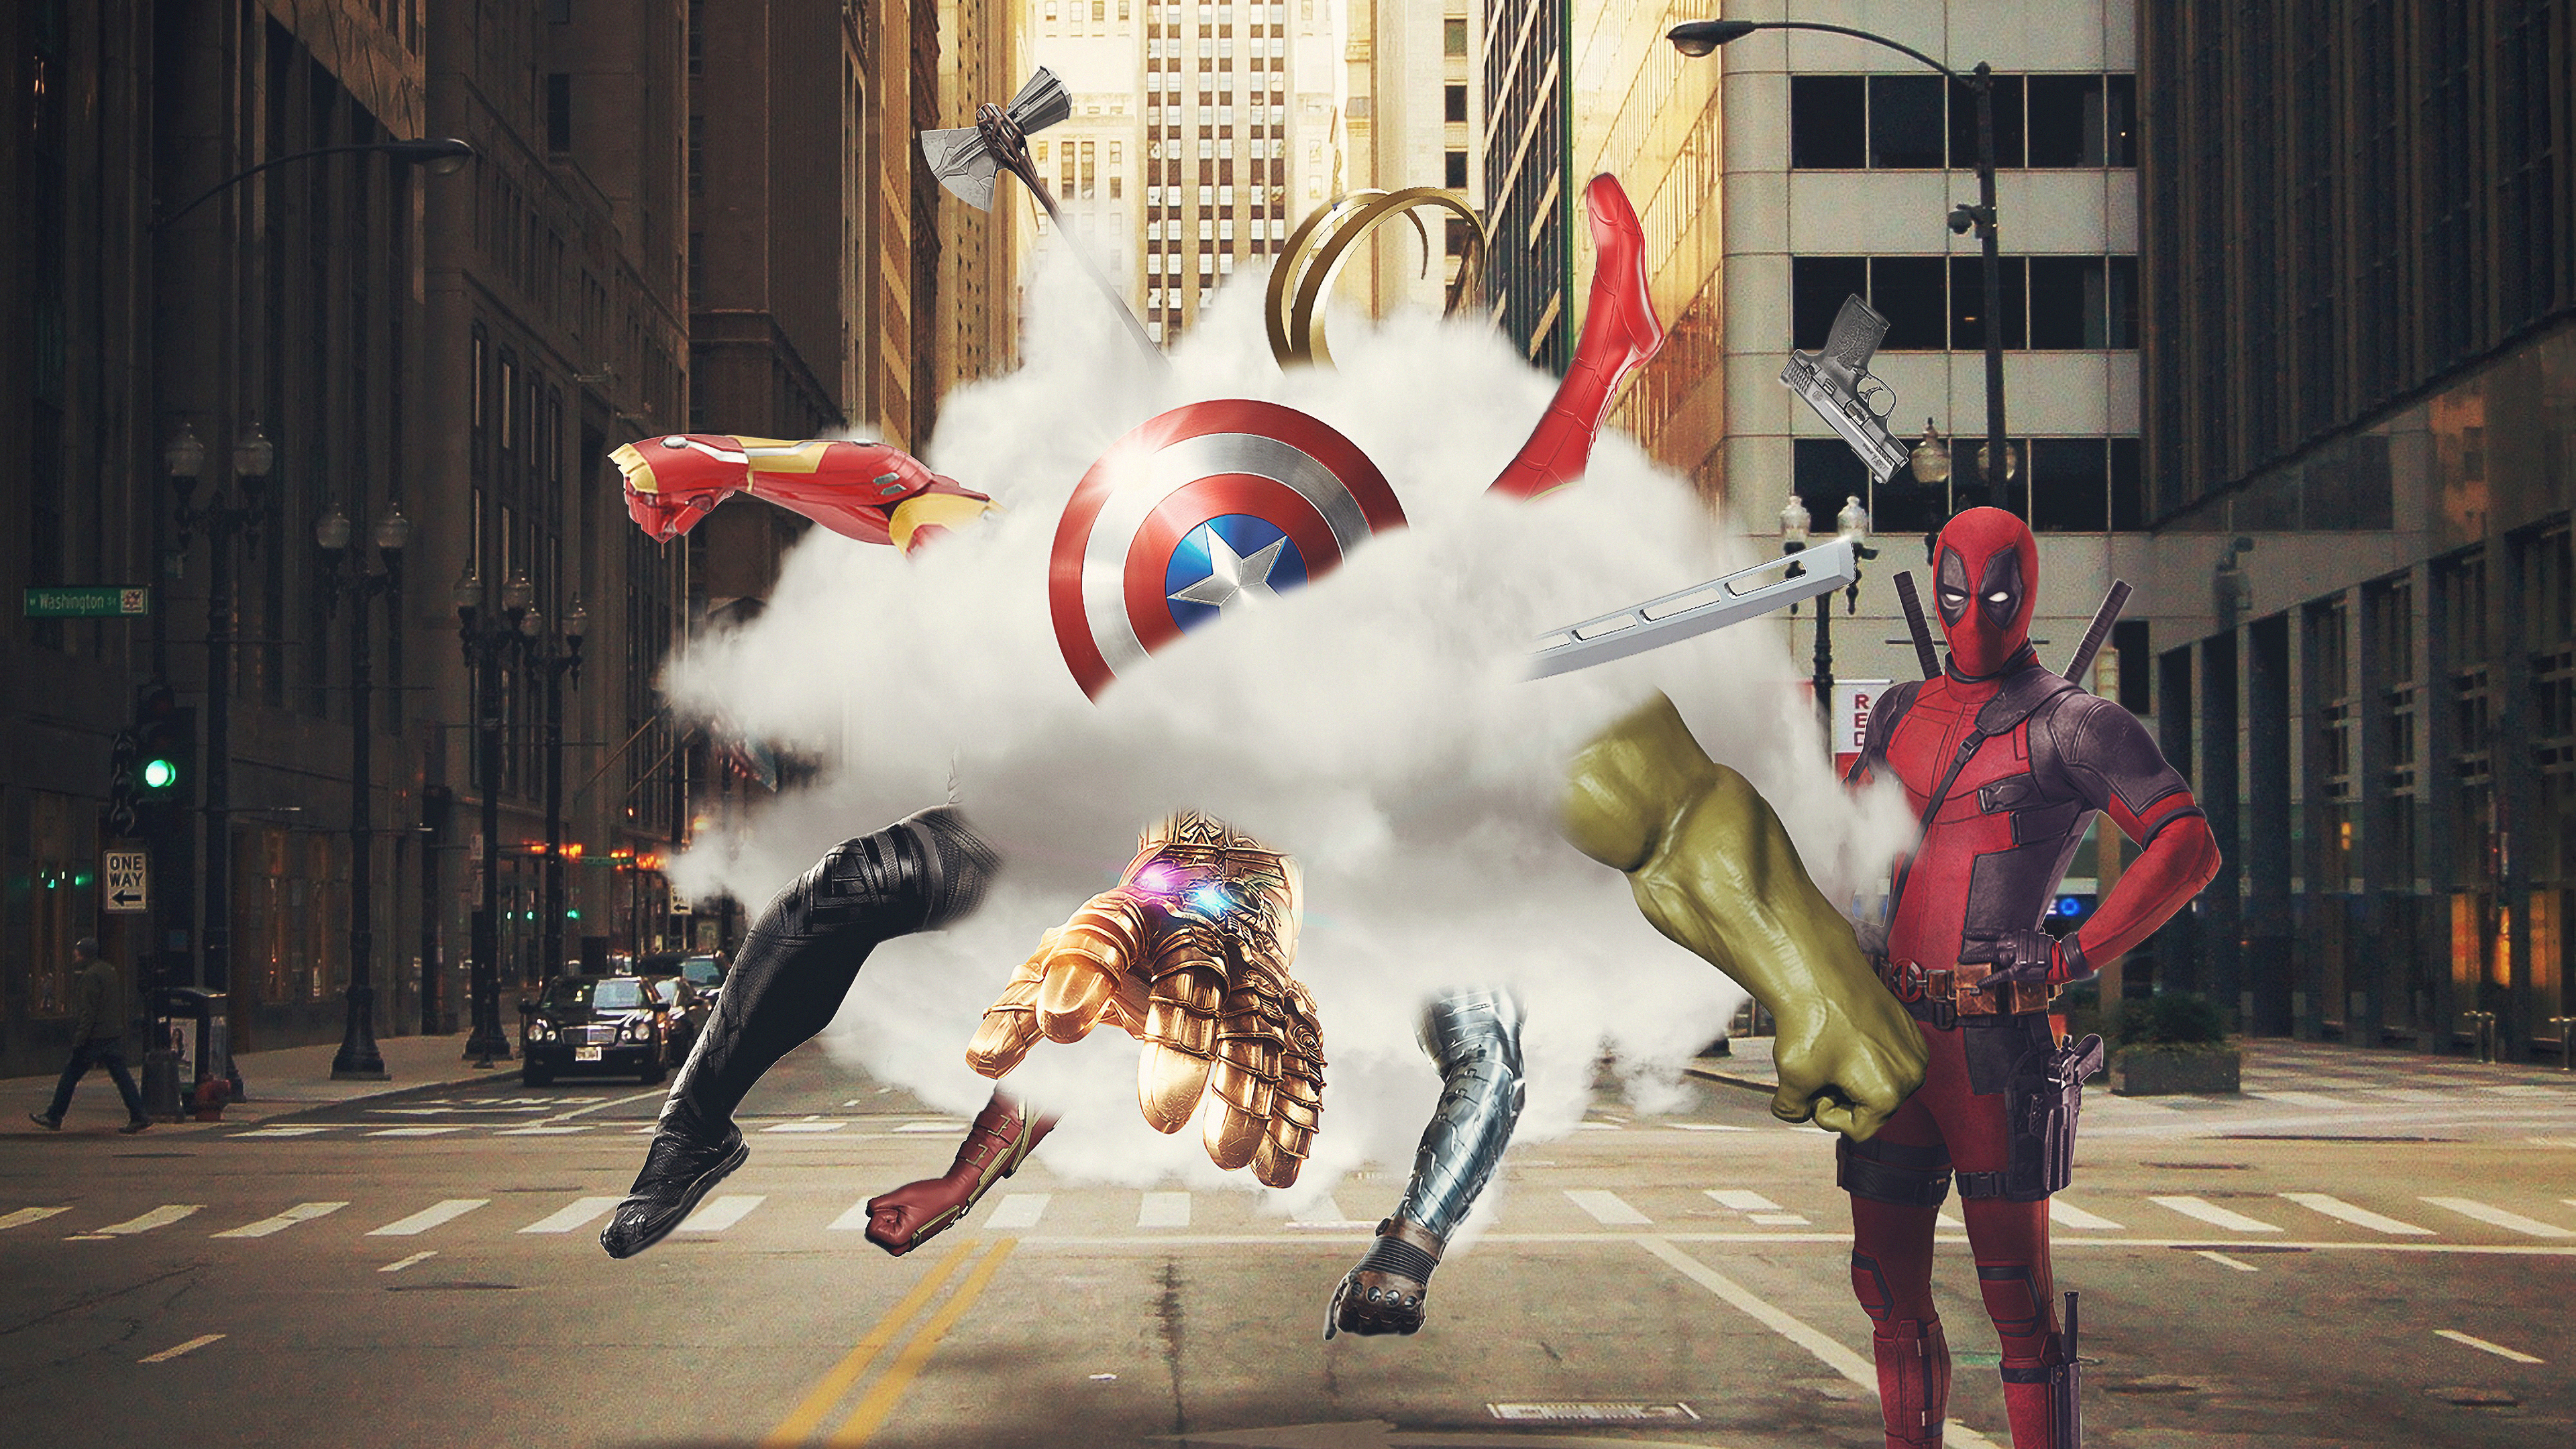 avengers and deadpool 1569186754 - Avengers And Deadpool - superheroes wallpapers, hd-wallpapers, deadpool wallpapers, behance wallpapers, avengers-wallpapers, artwork wallpapers, 4k-wallpapers